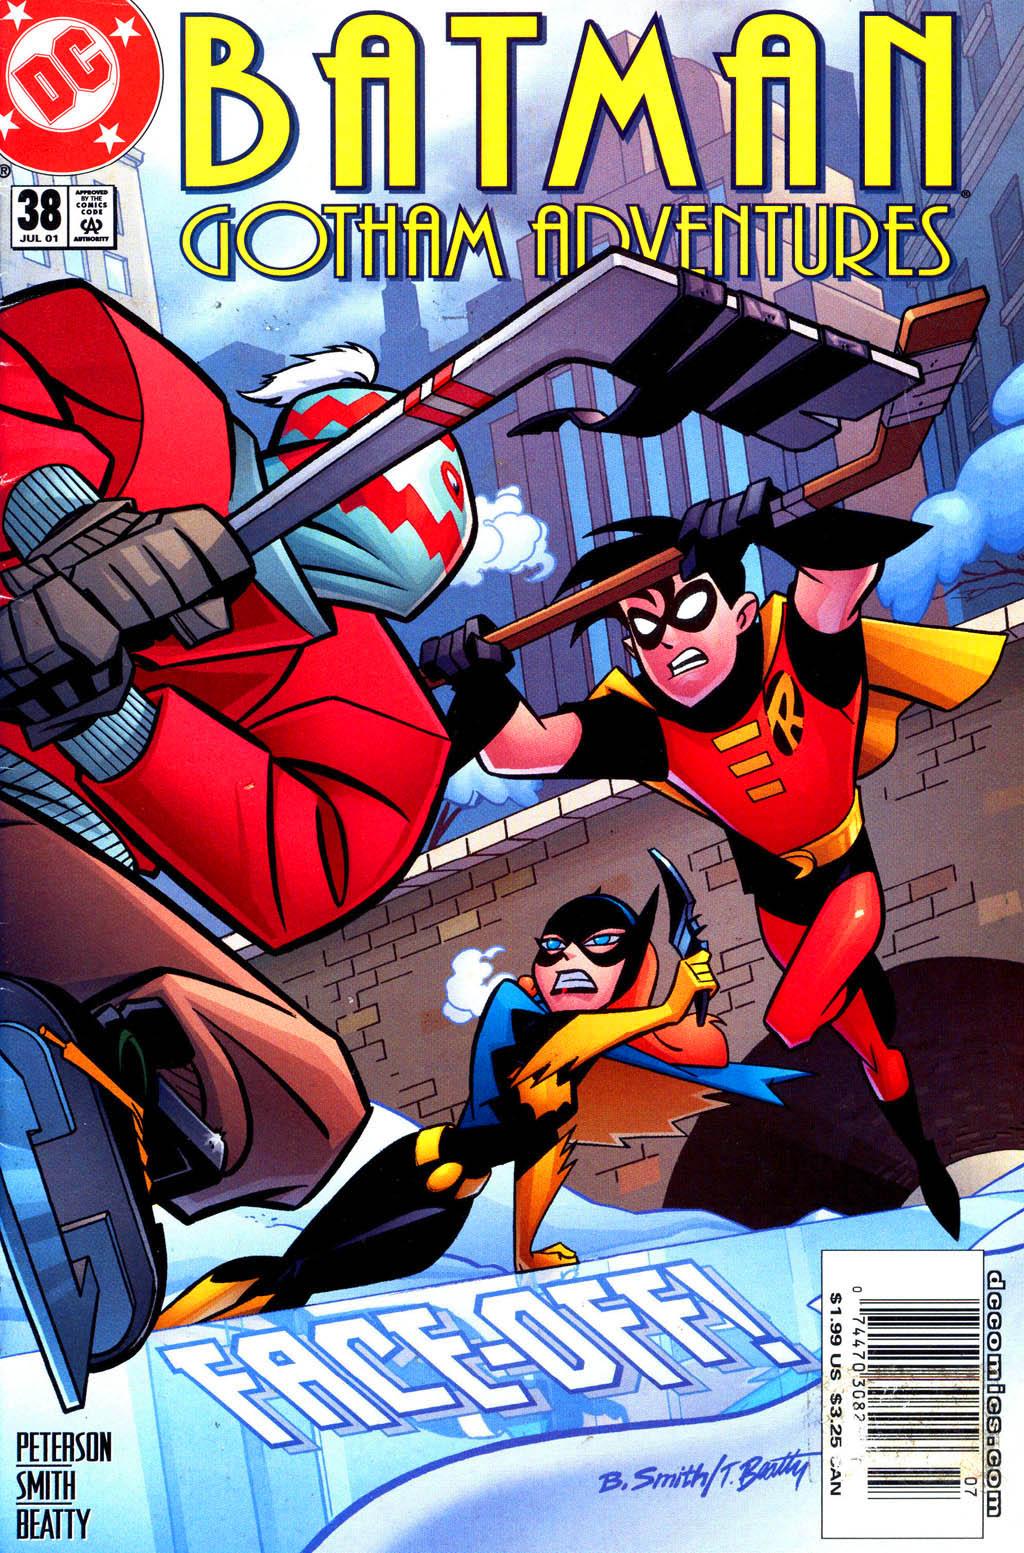 Batman: Gotham Adventures 38 Page 1